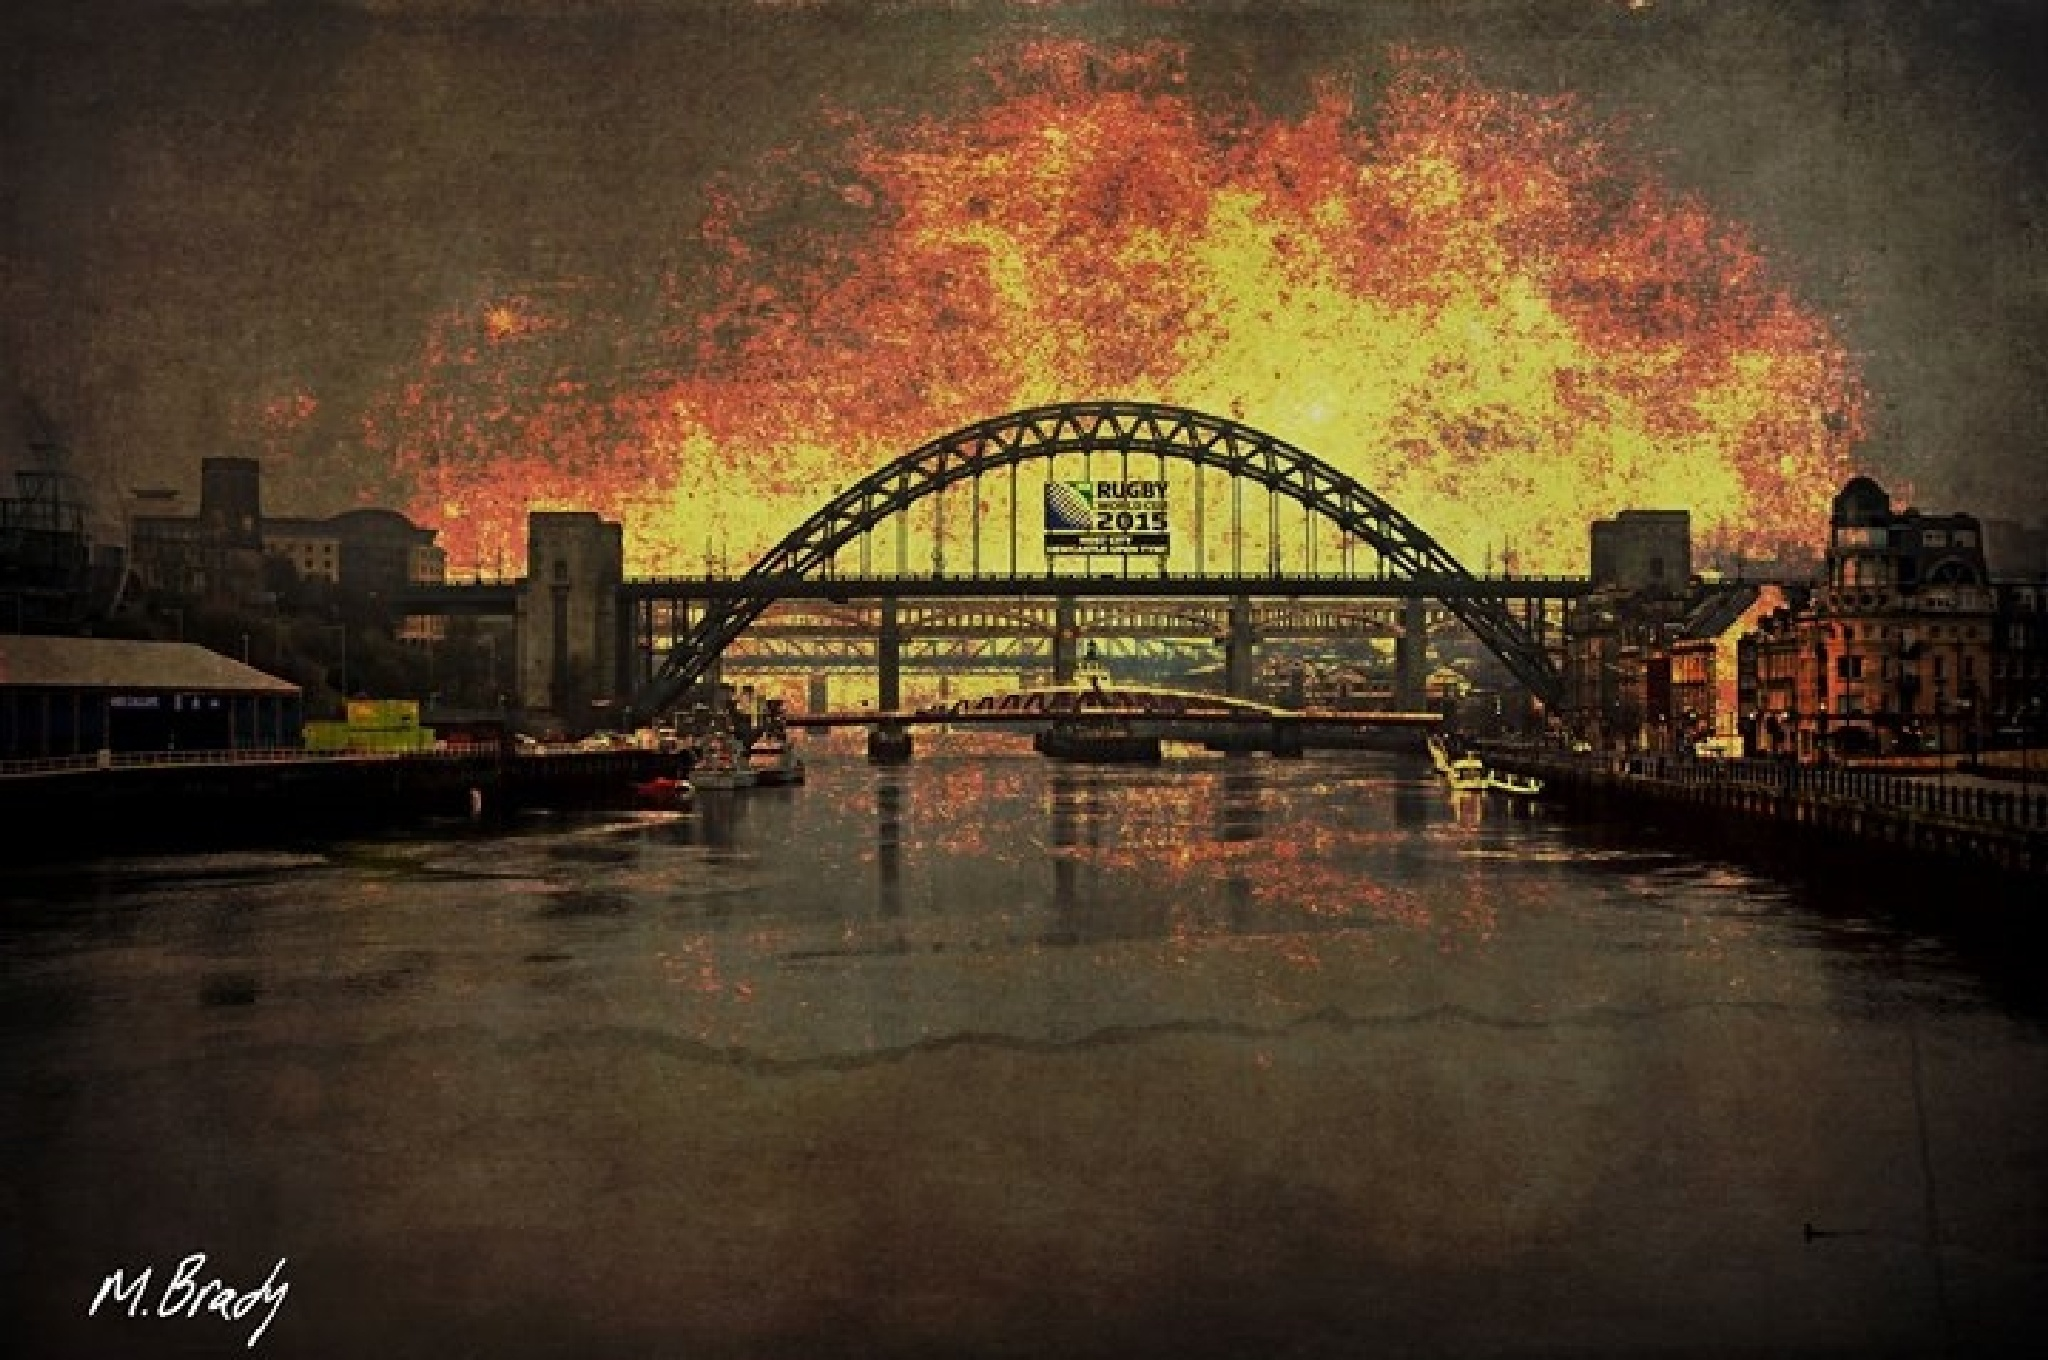 Bridges of Tyne by Michael Brady